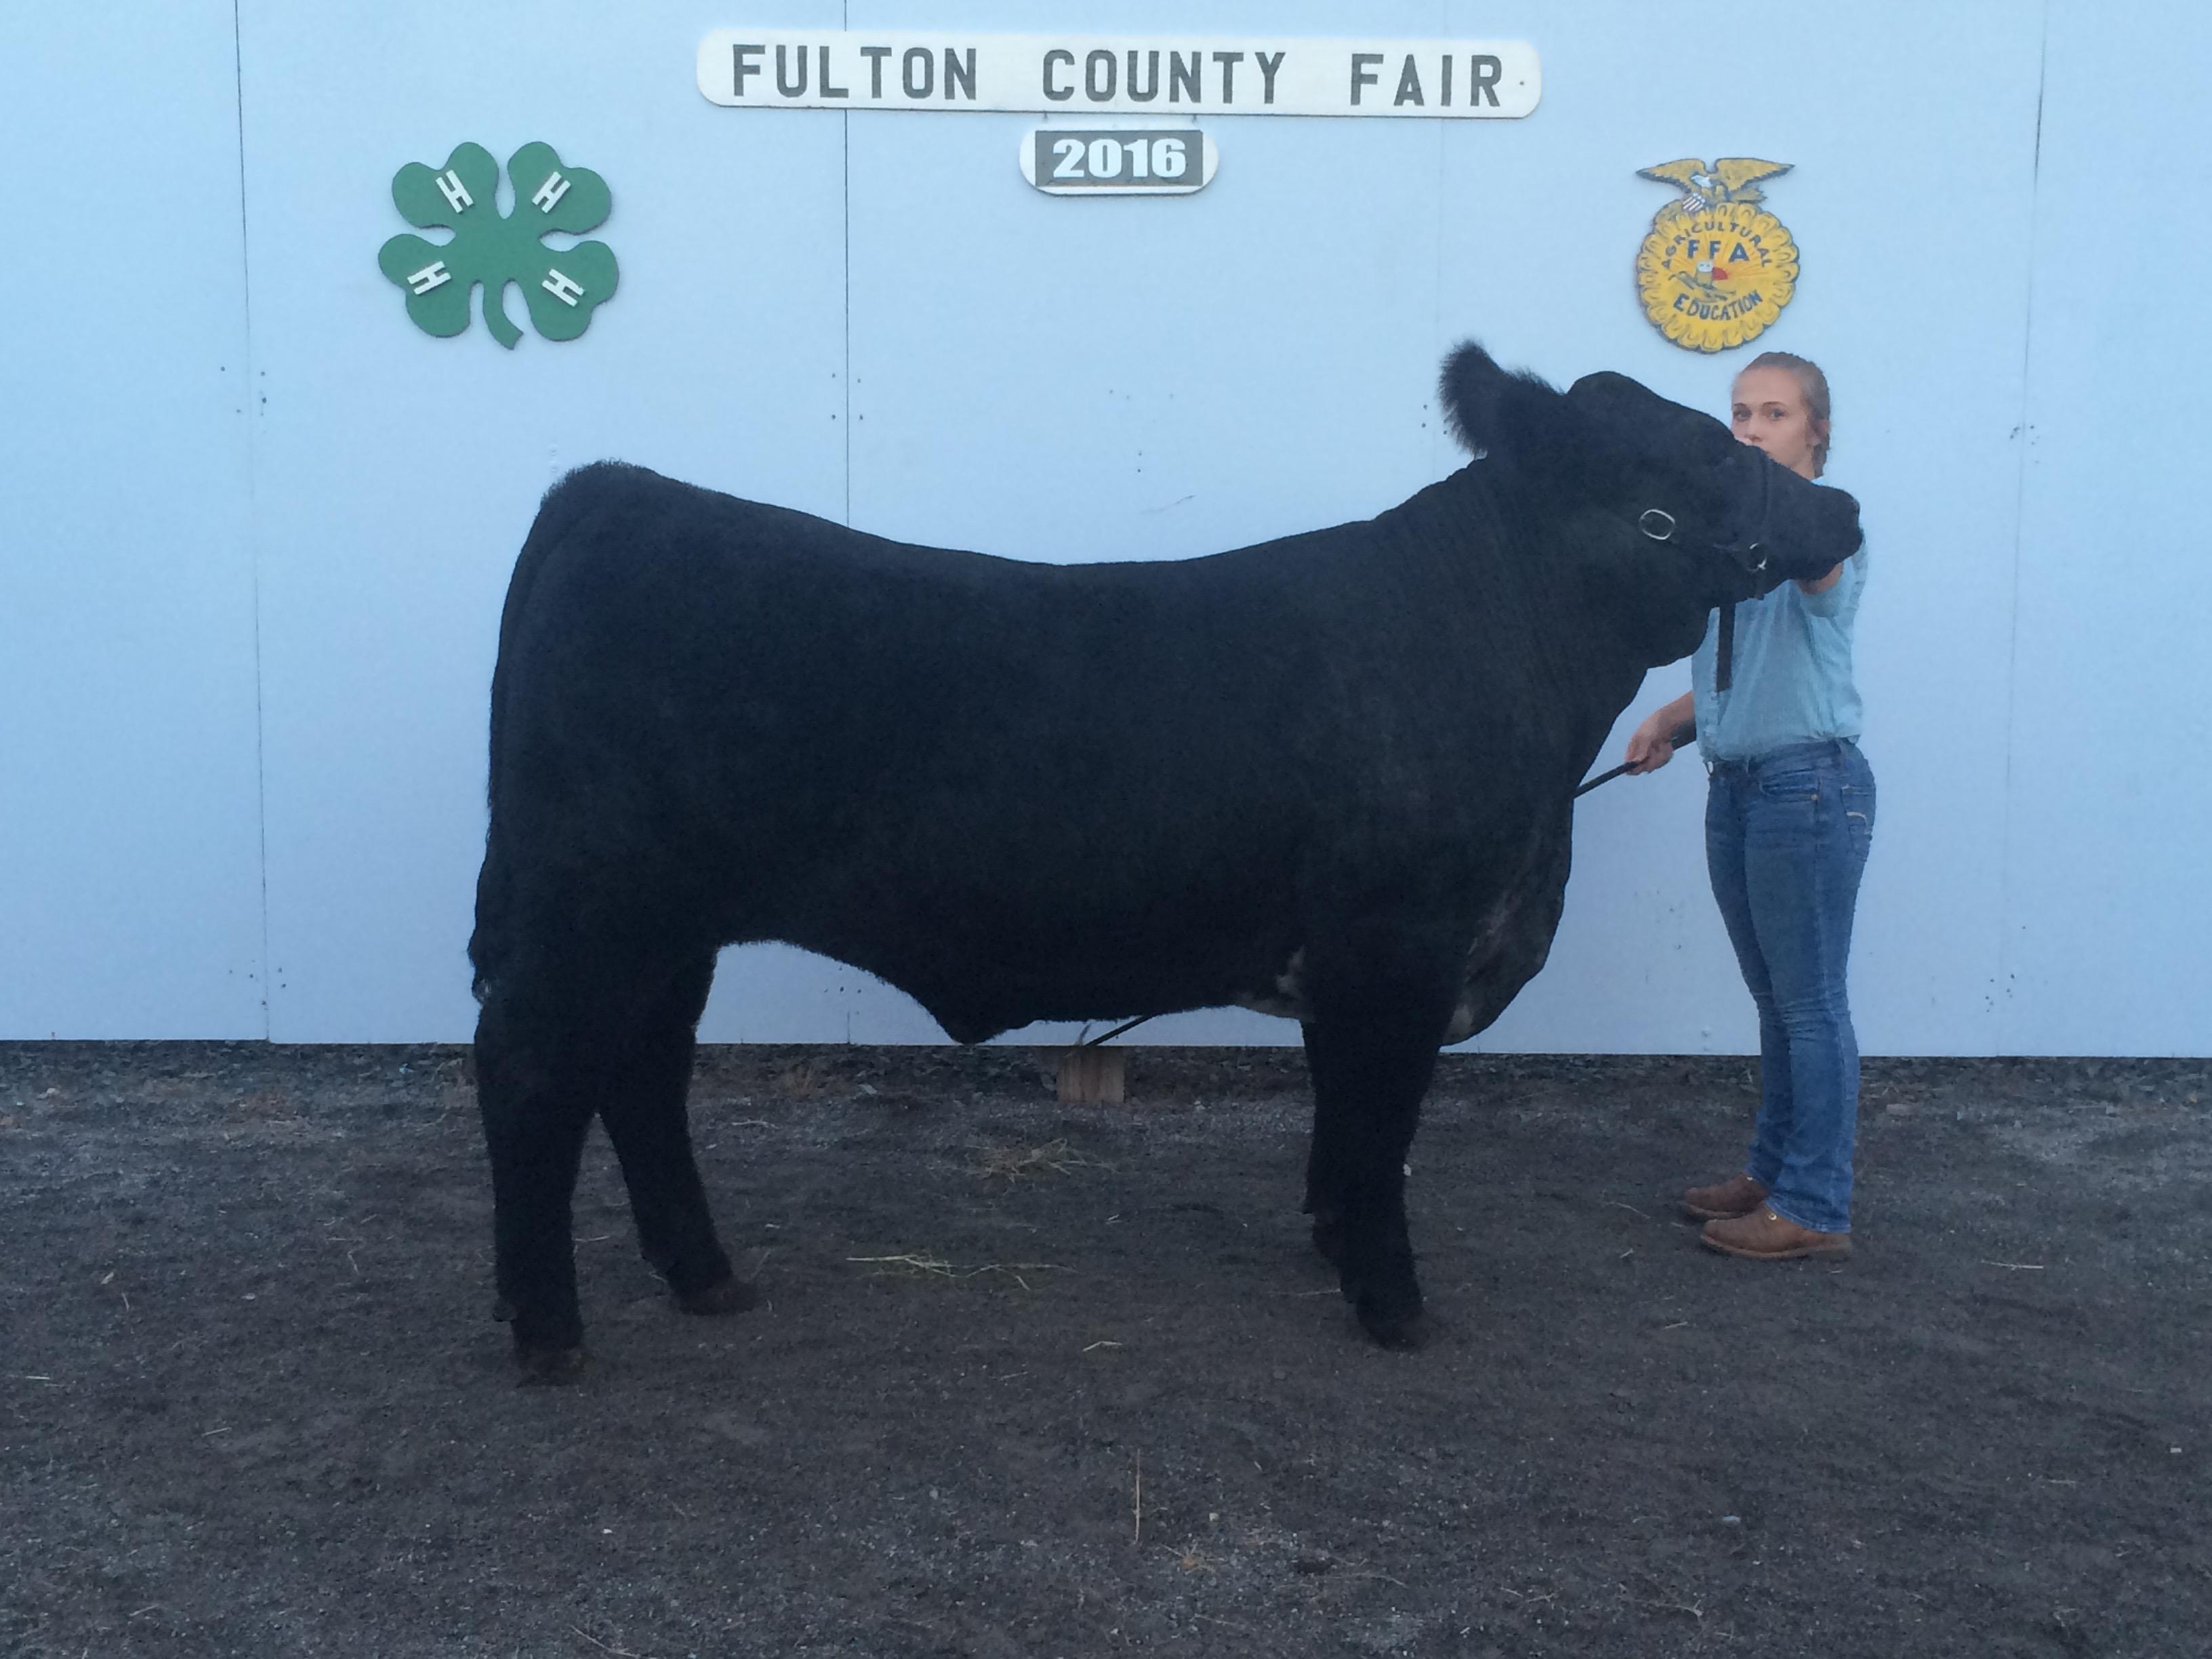 Fulton County Fair 2016